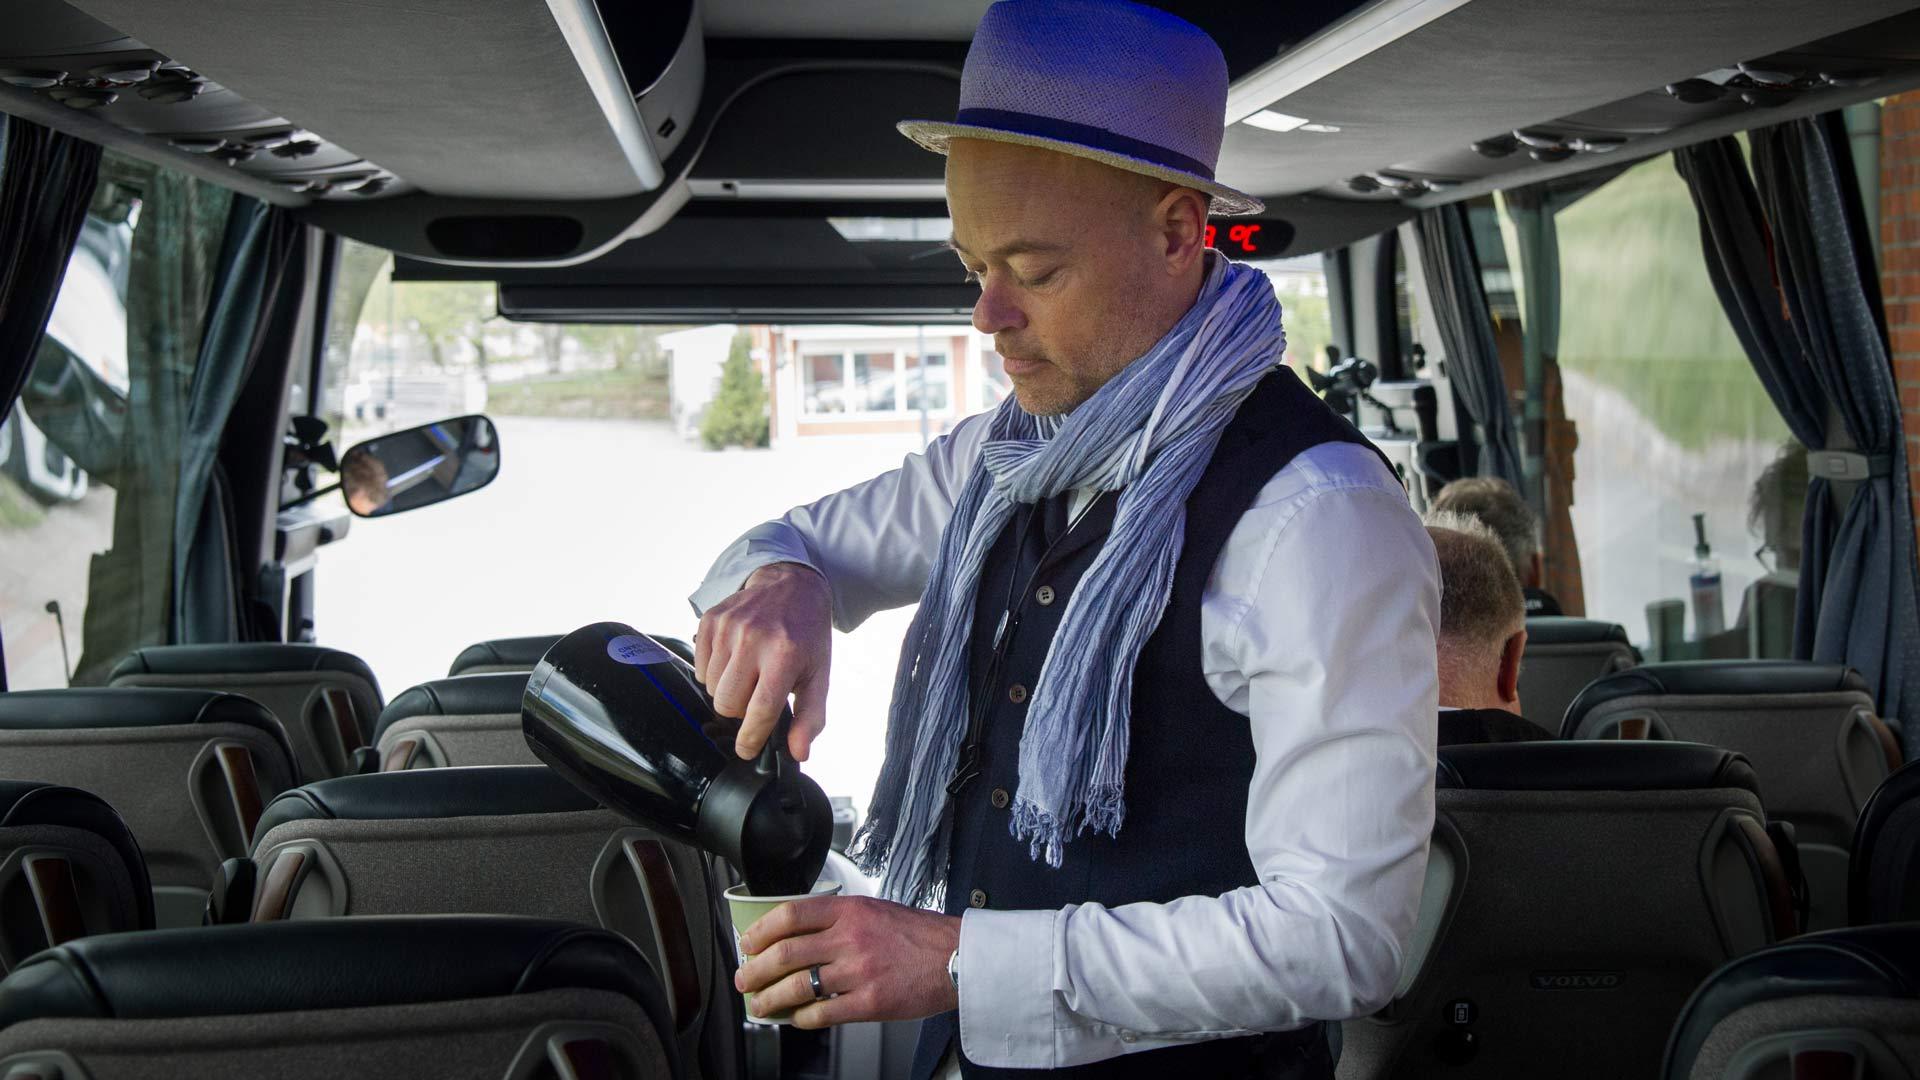 Joakim dricker en kopp kaffe i turnébussen